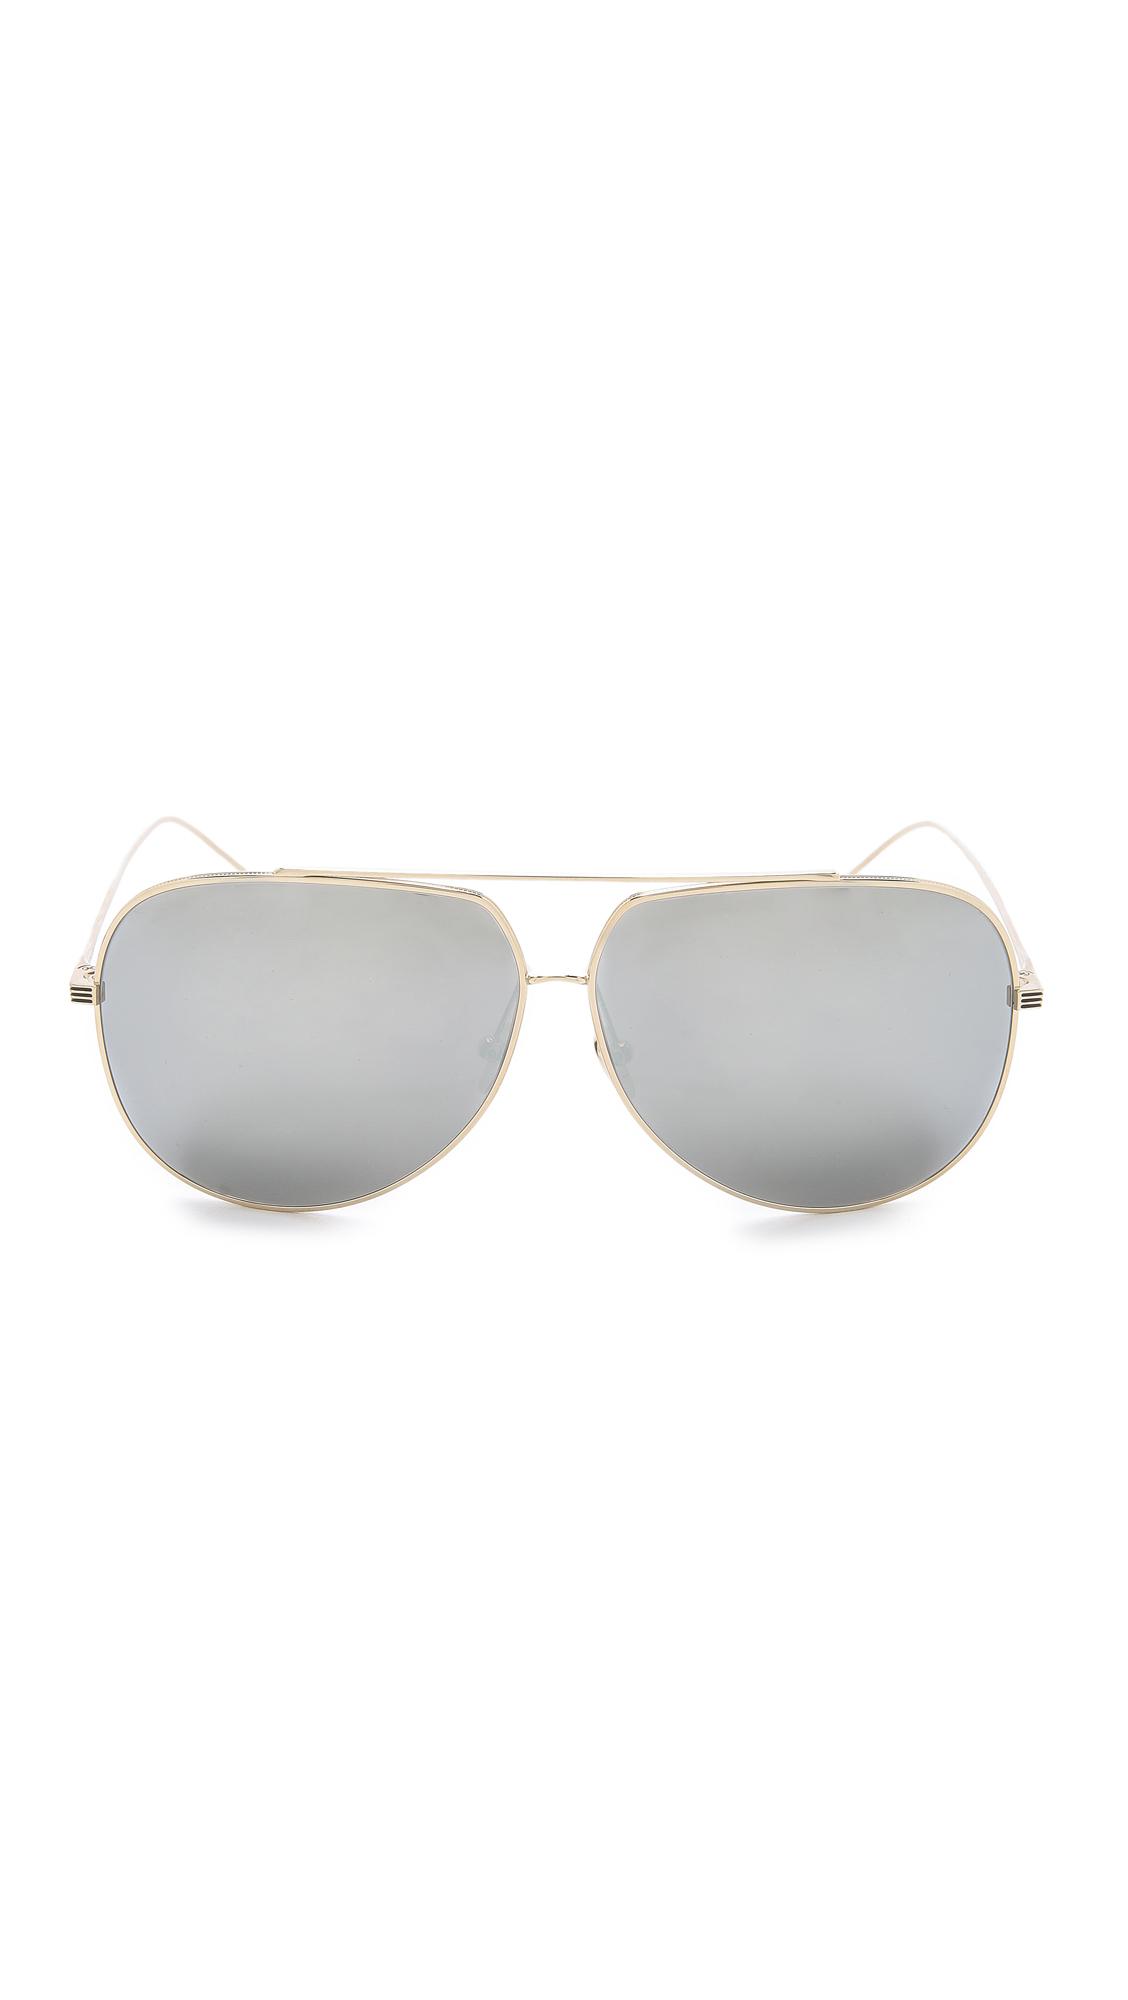 86984fd049 Dita Polarized Mirrored Sunglasses